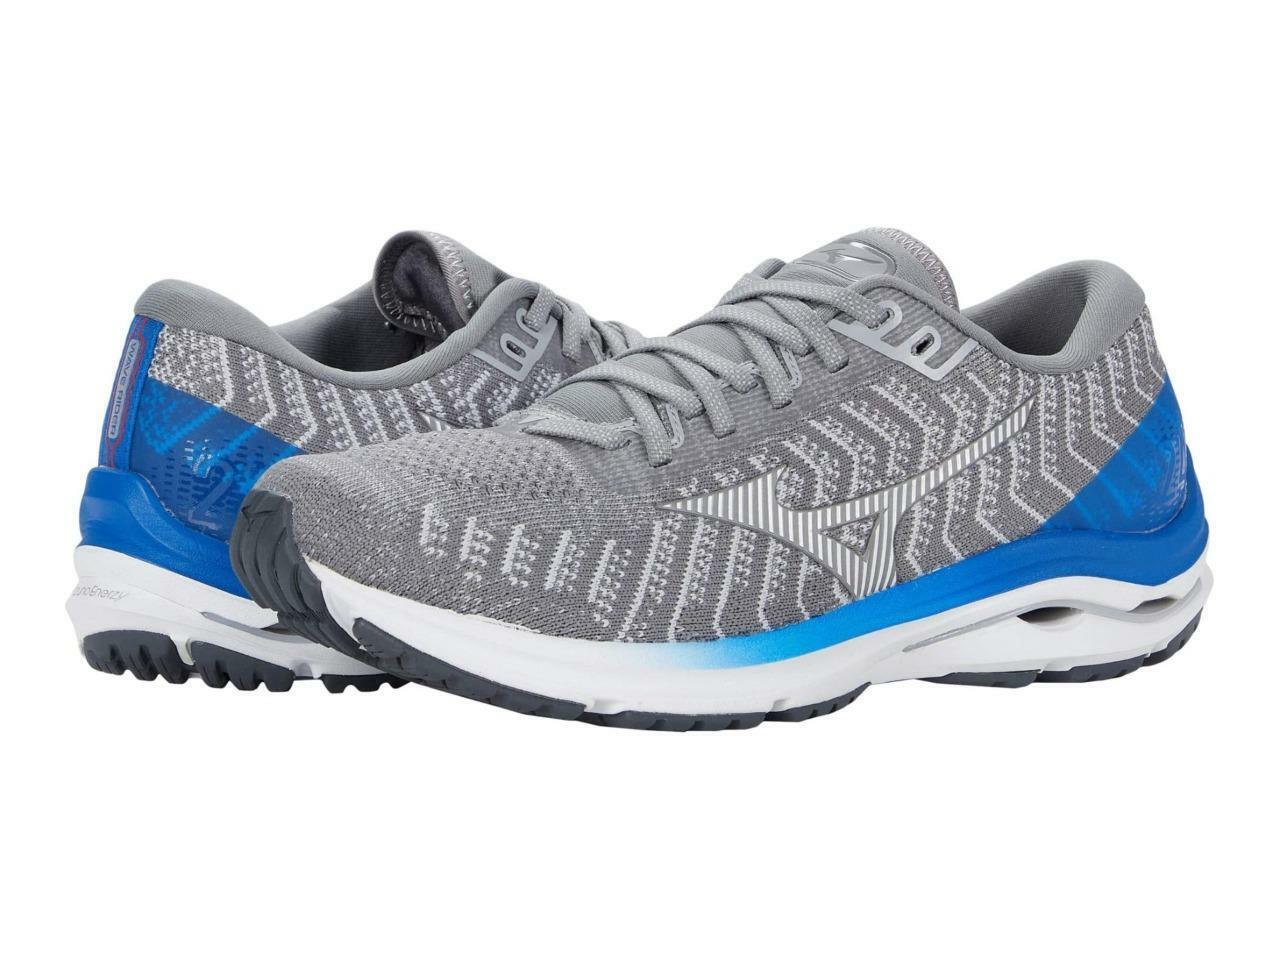 New Men's Mizuno Wave Rider 24 Waveknit Running Shoes Size 11 Gray 411225-FG00